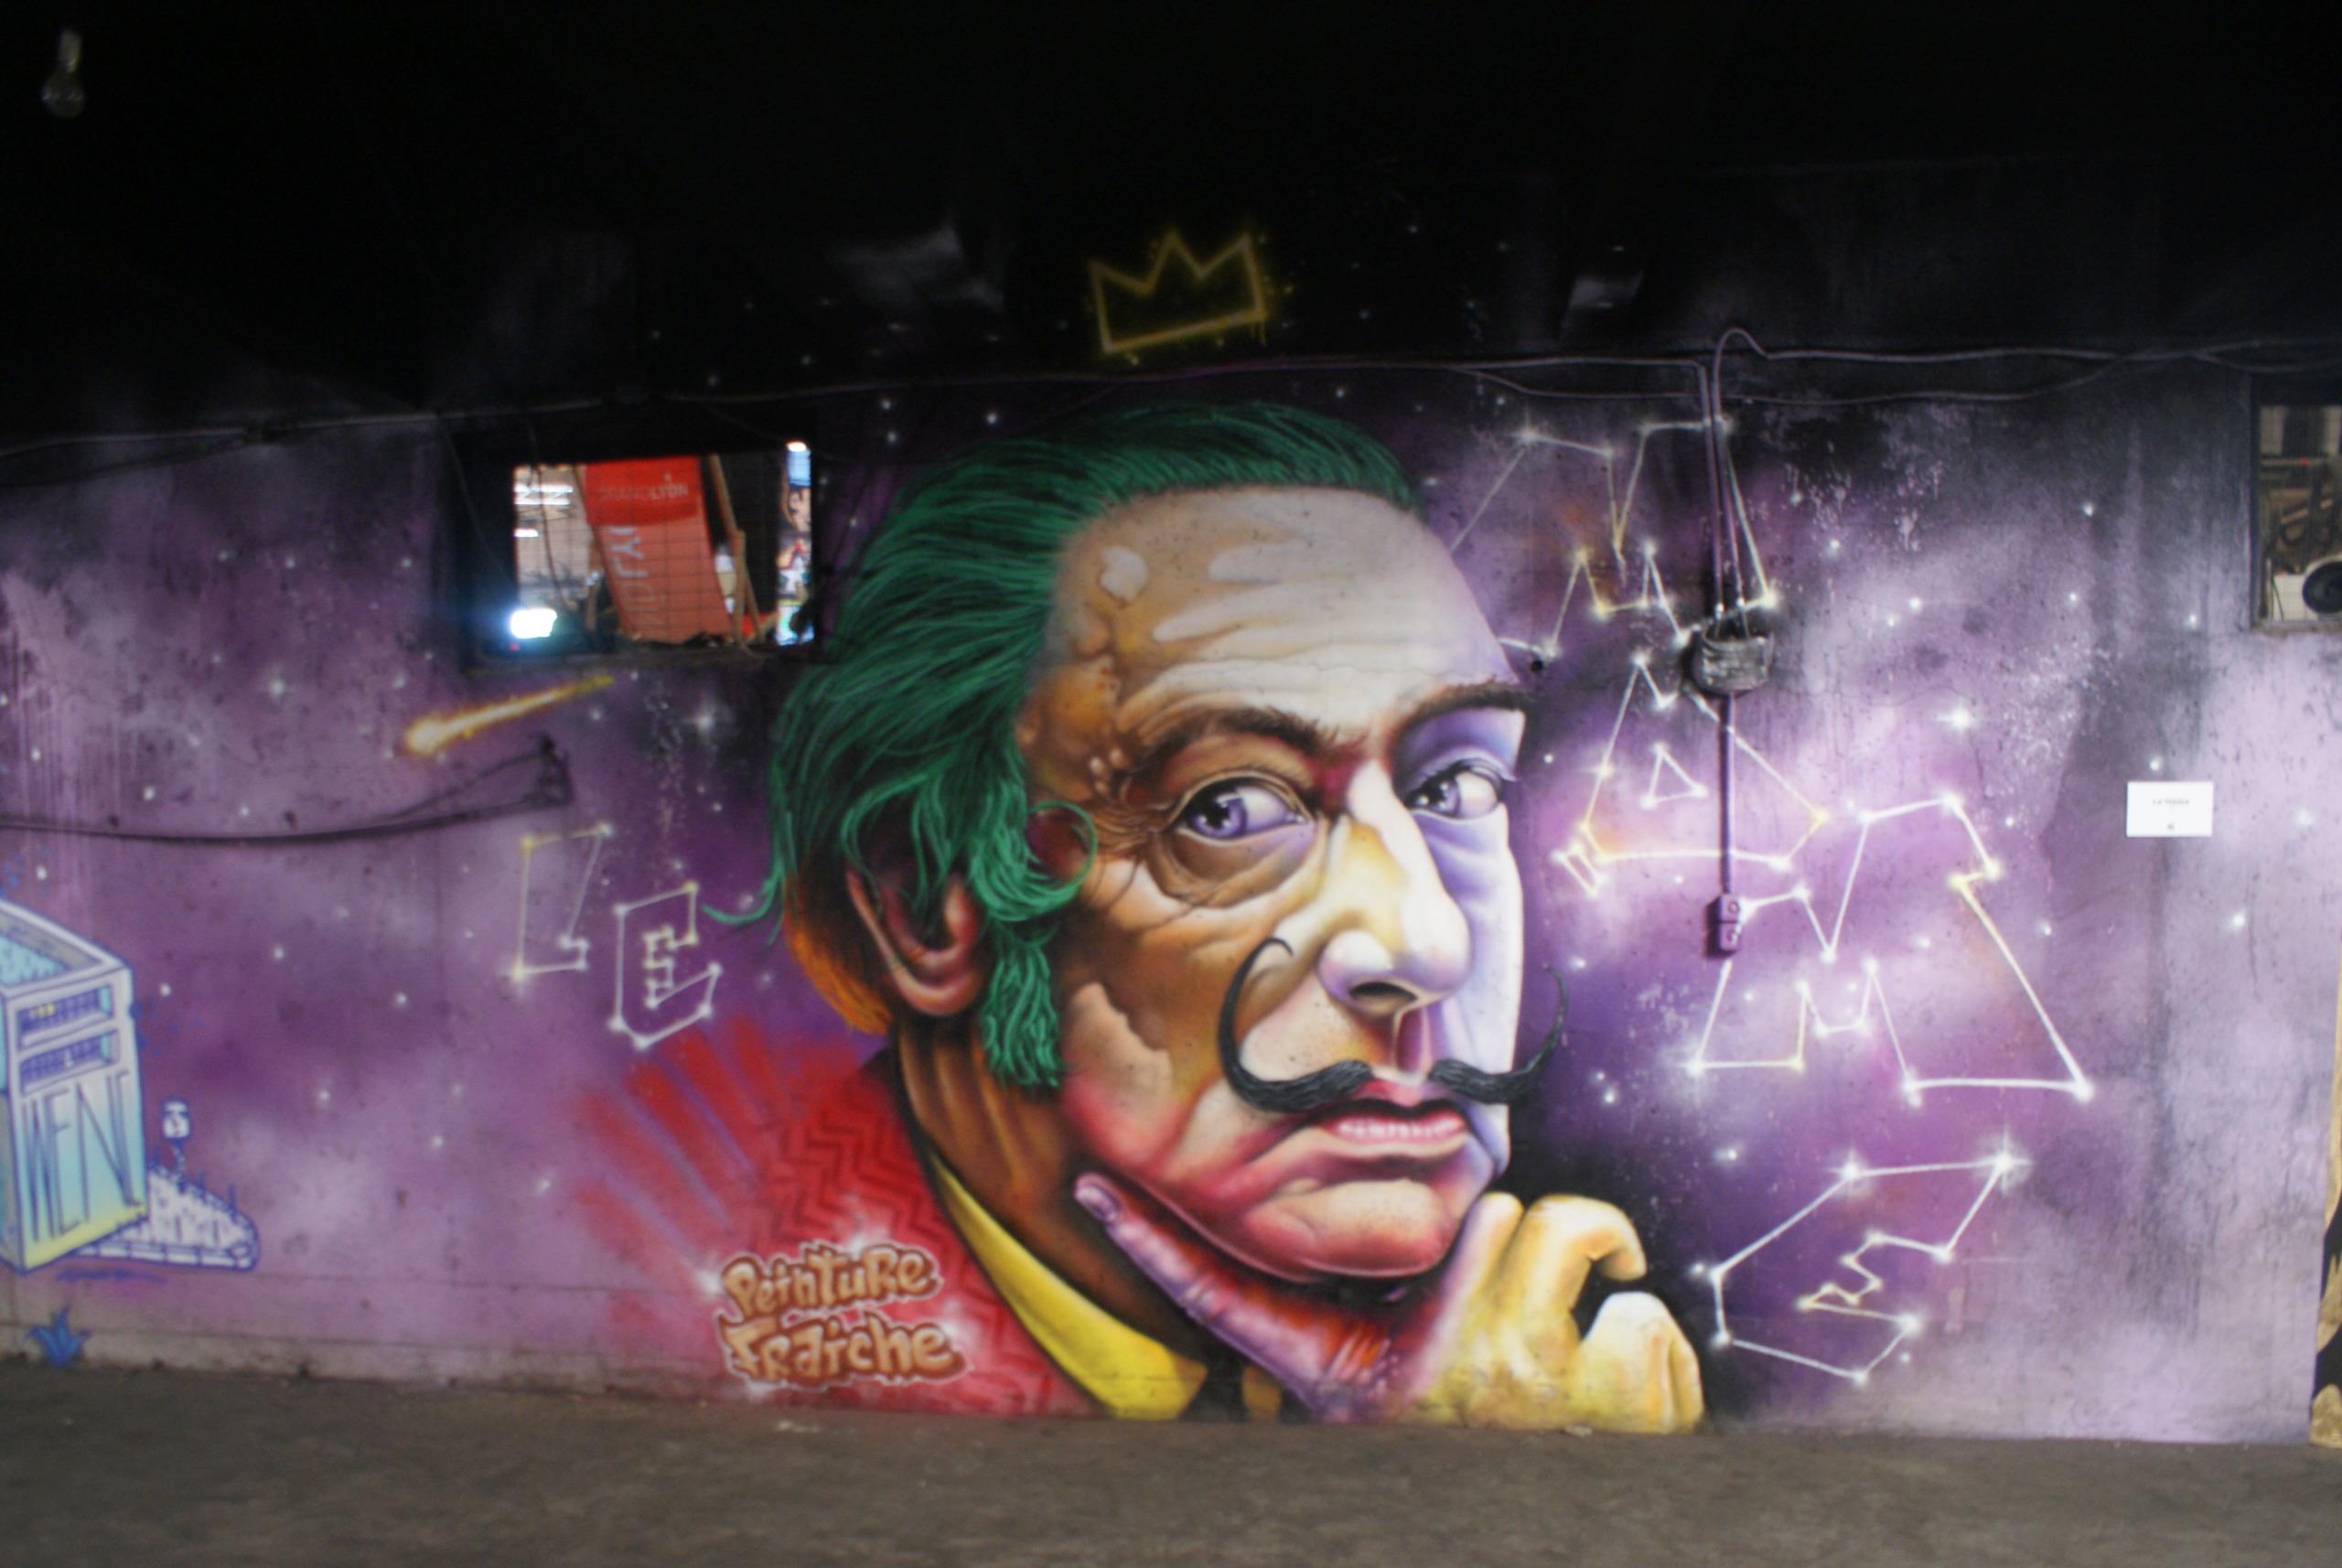 [street art-rue et manifs] Peinture fraîche, à Lyon 2019 Dsc05112